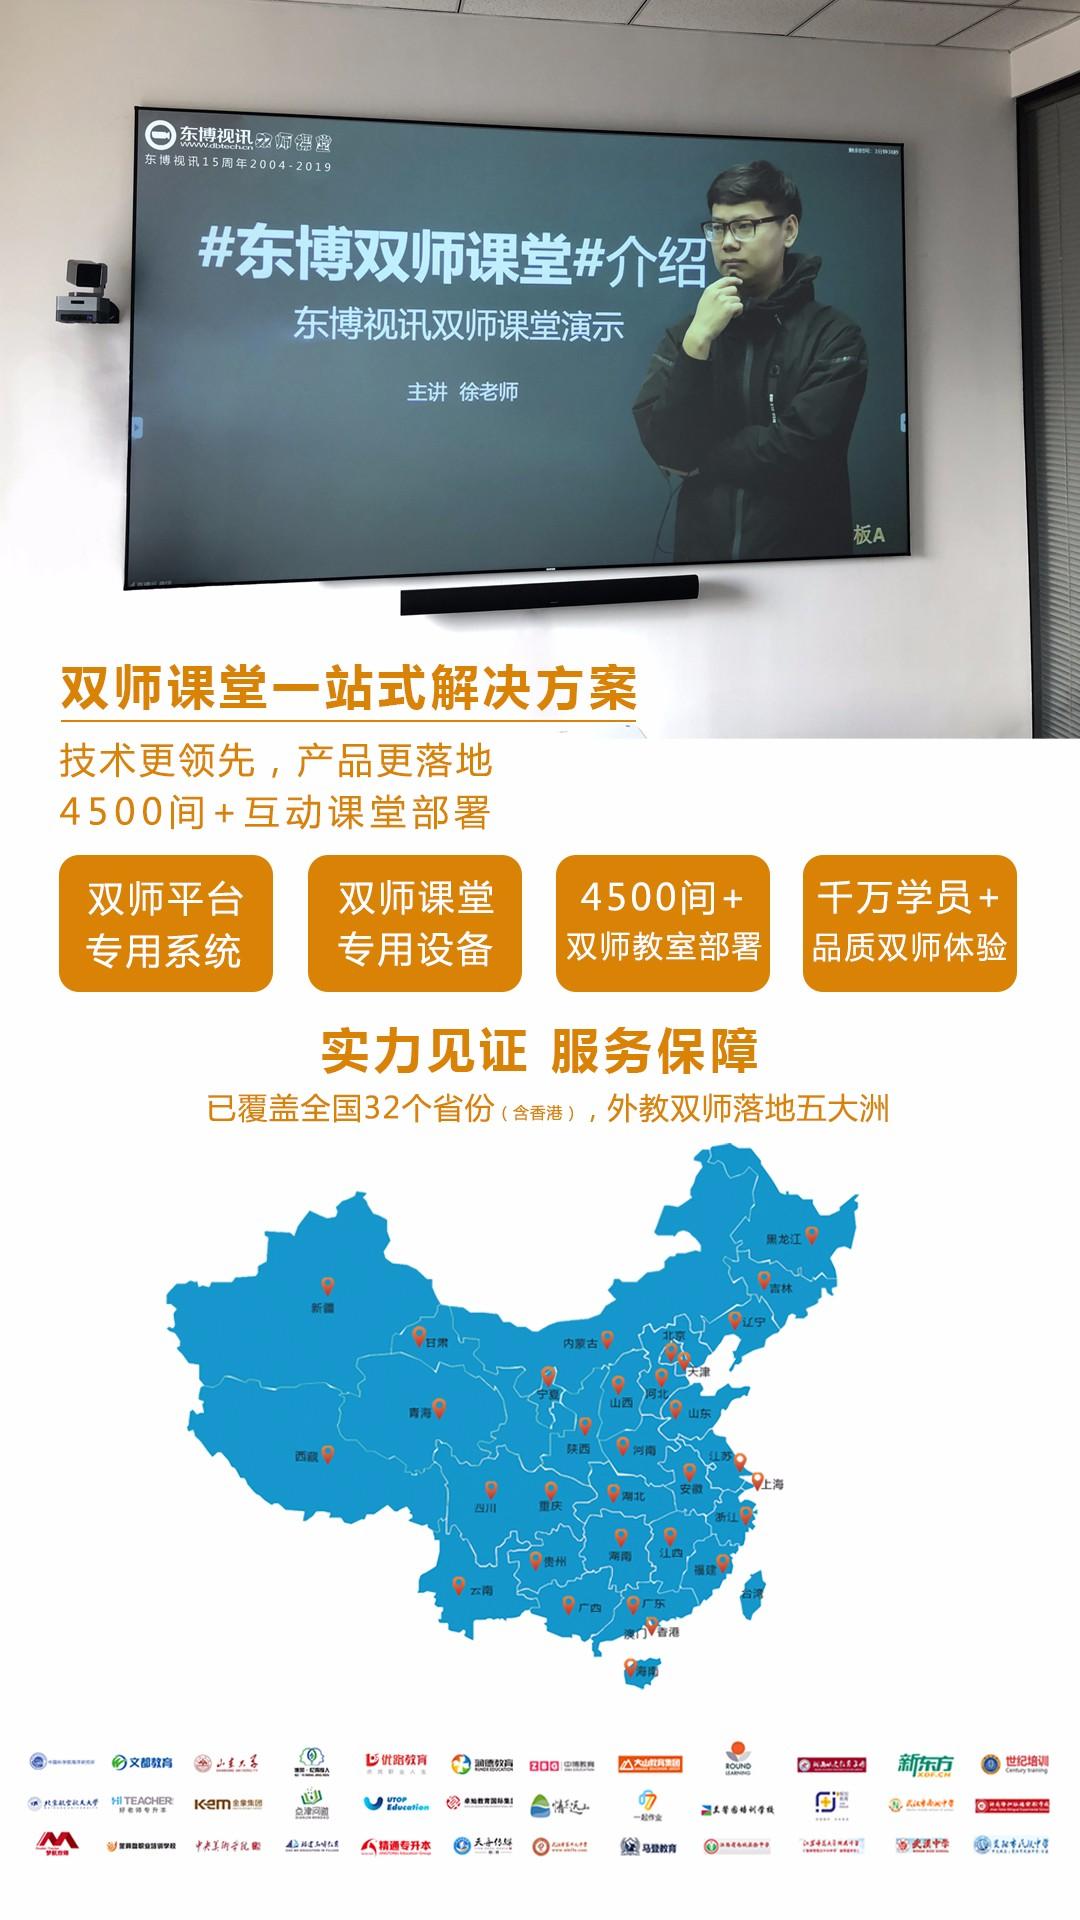 kok软件app下载kok娱乐图片双师课堂.jpg